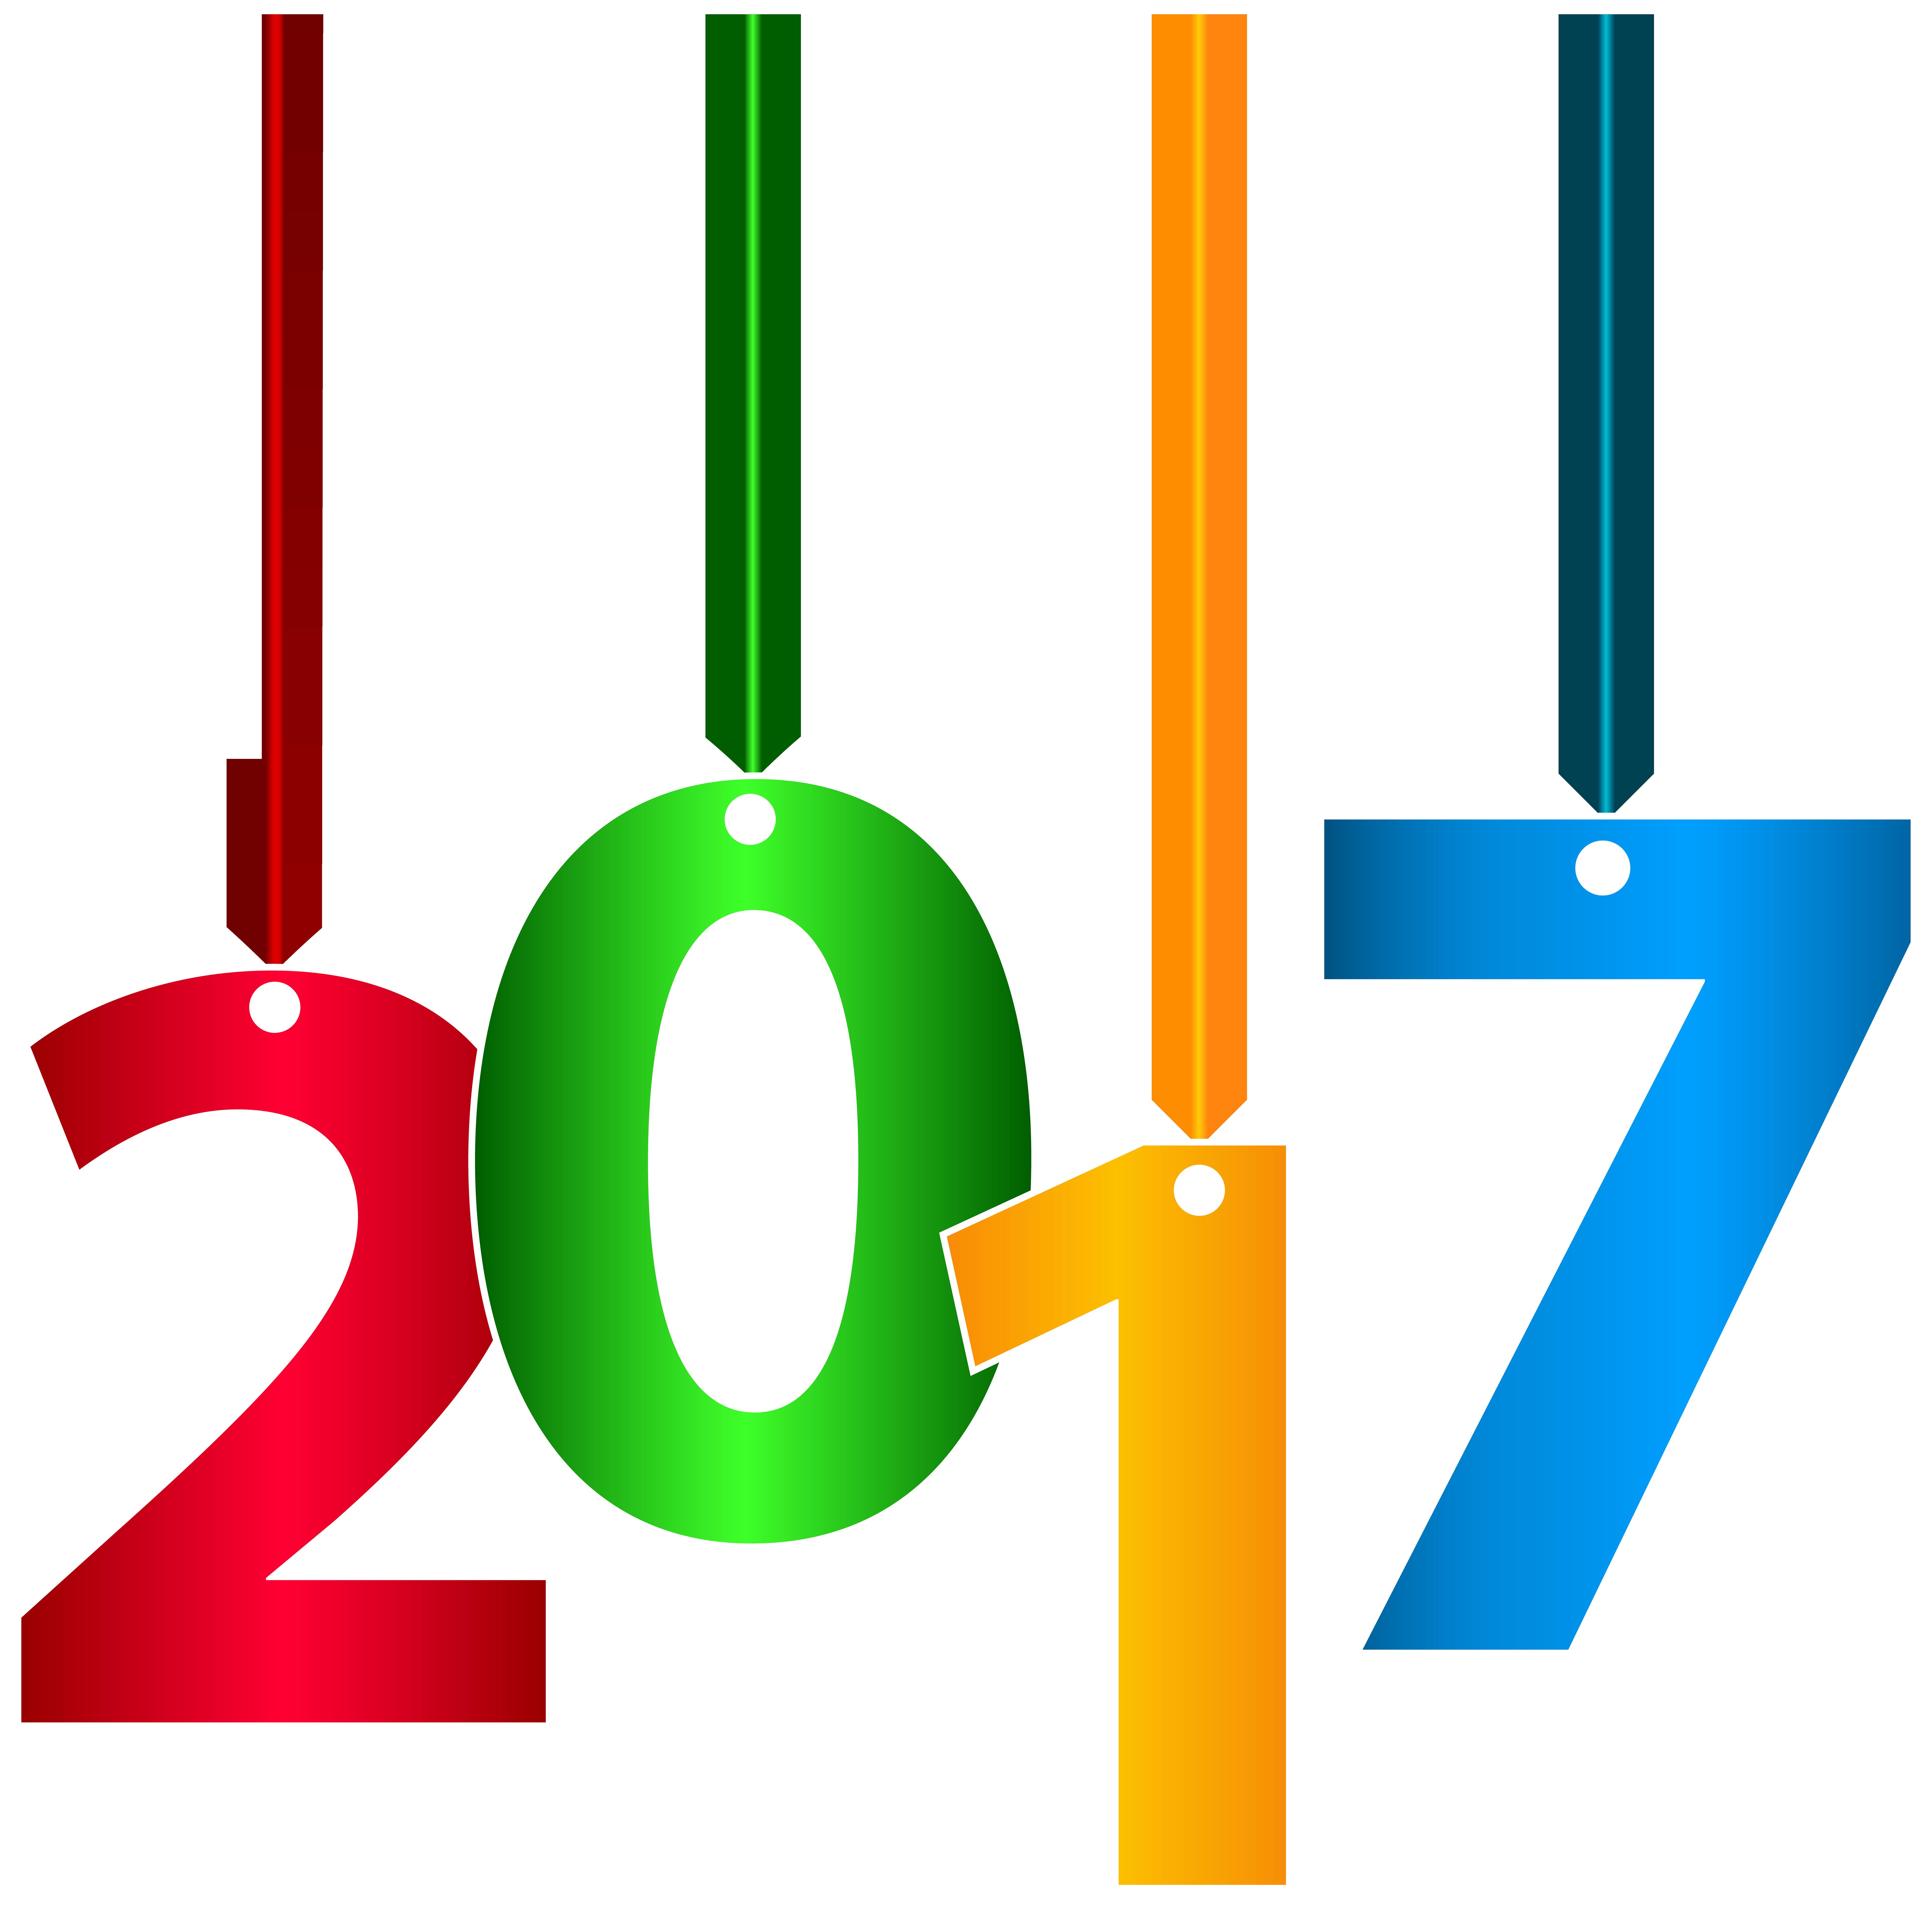 2017 Hanging Transparent Clip Art PNG Image.